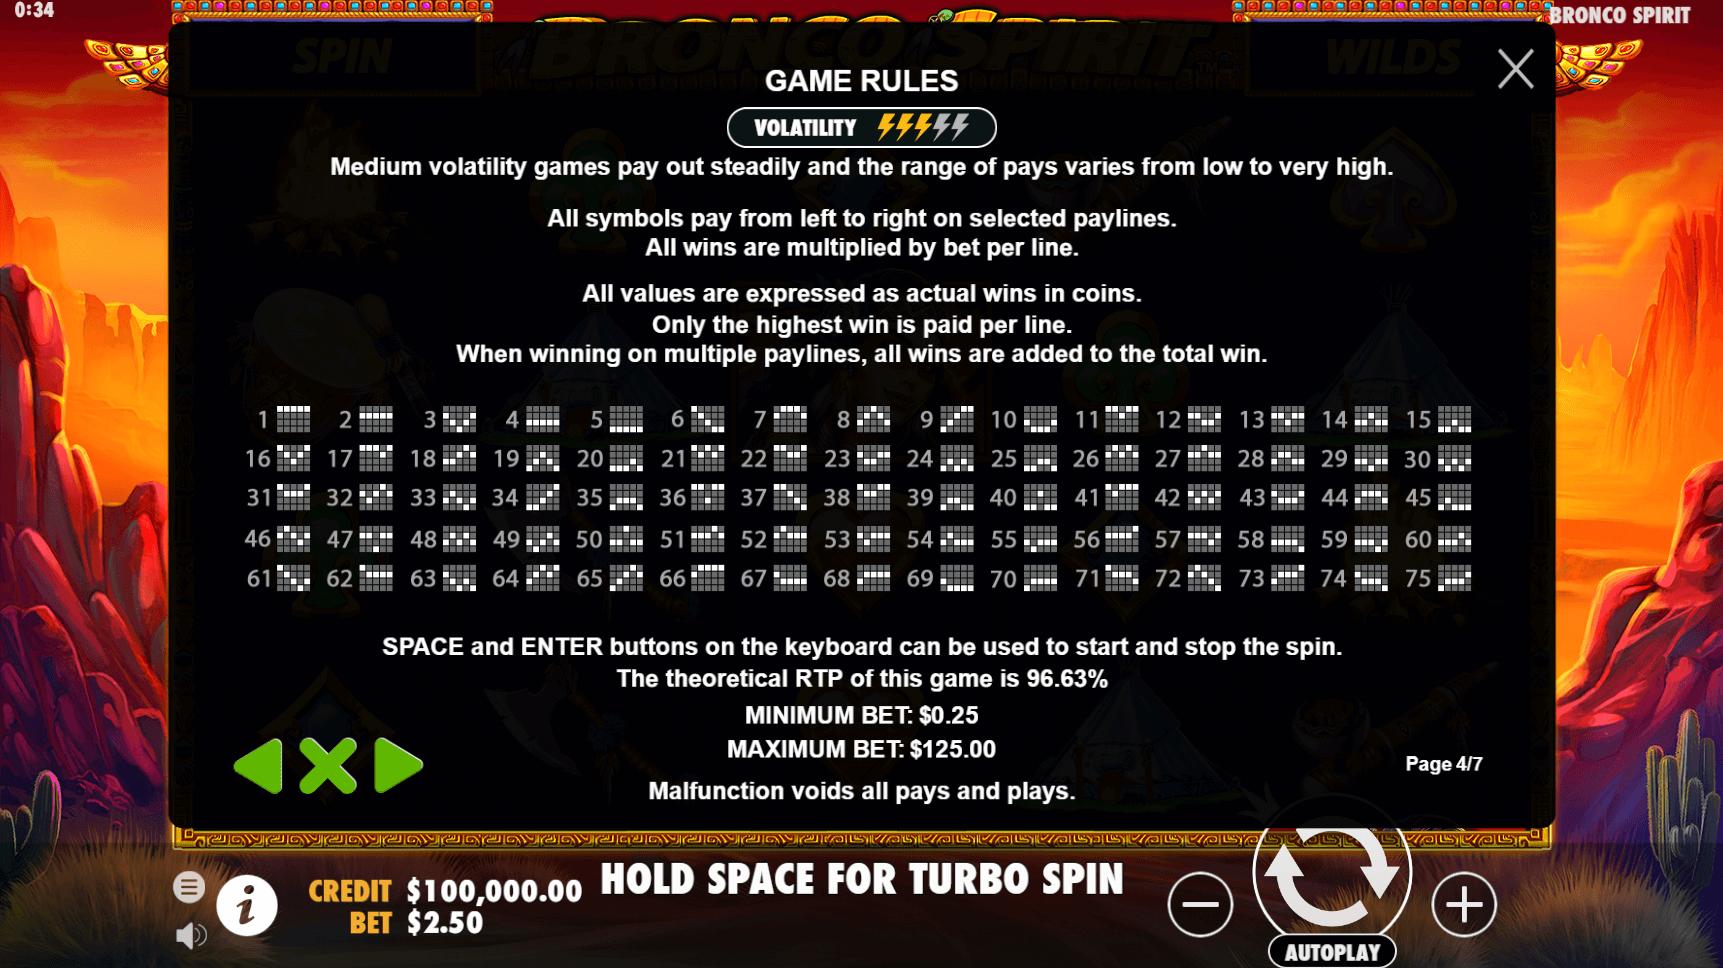 Bronco Spirit Slot Machine